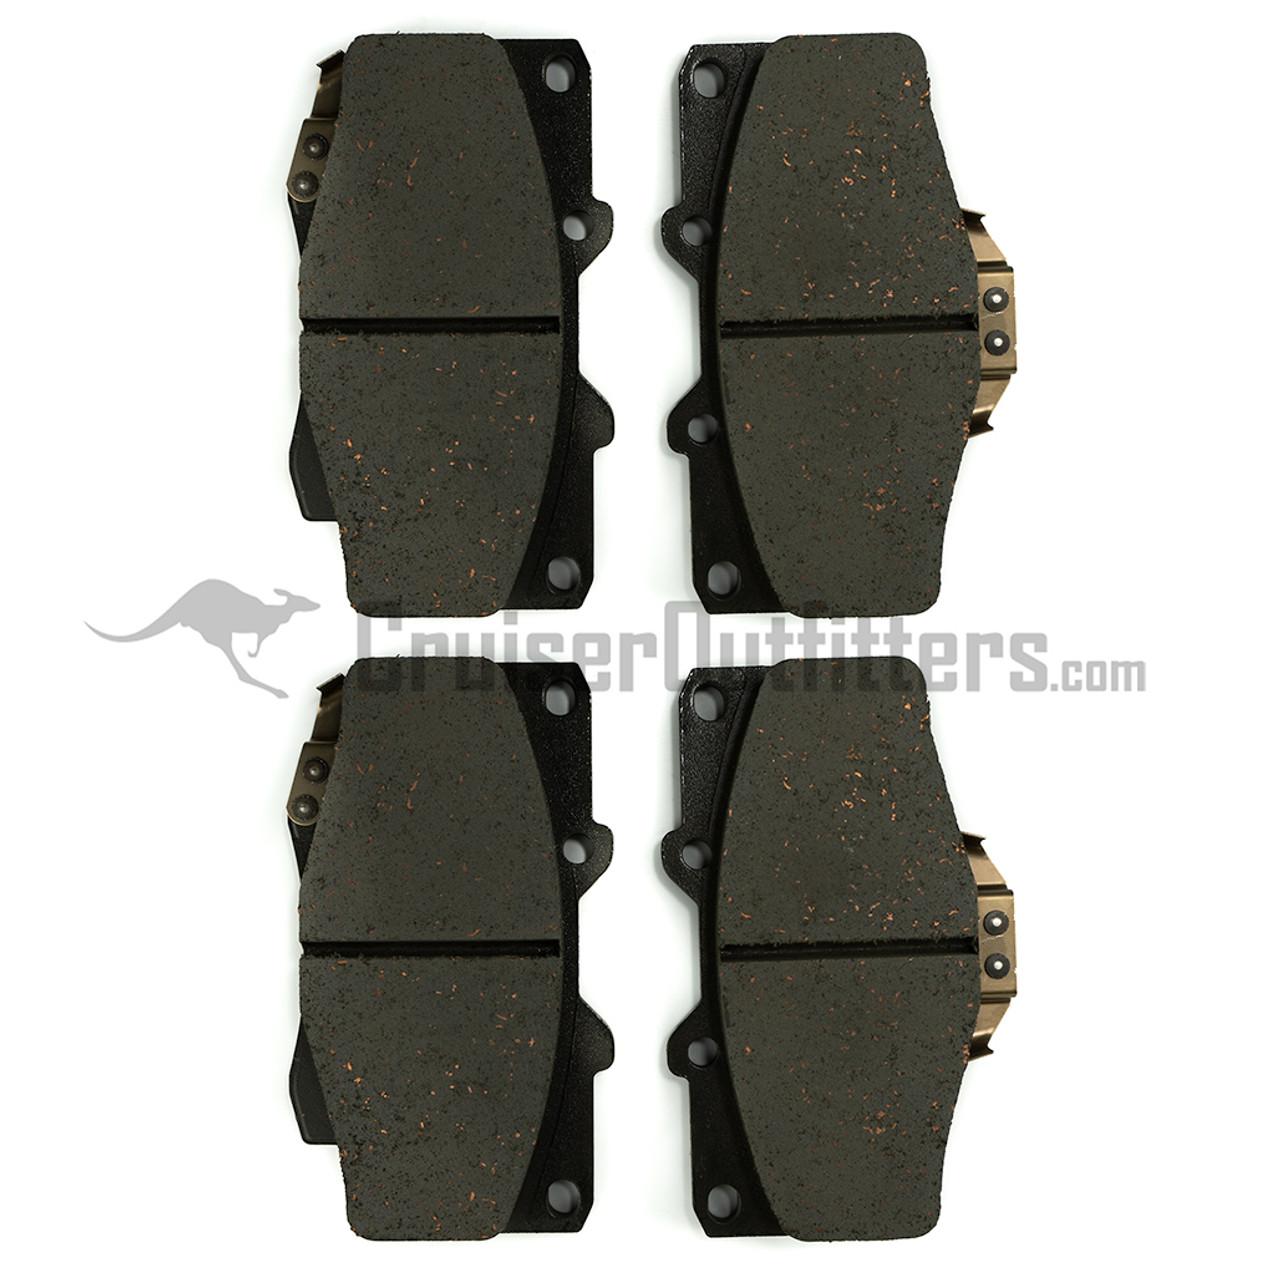 BRAD0436 - Front Brake Pads - Fits 1990+ 7x Series & 1989-1995 Truck/4Runner (ADVICS)